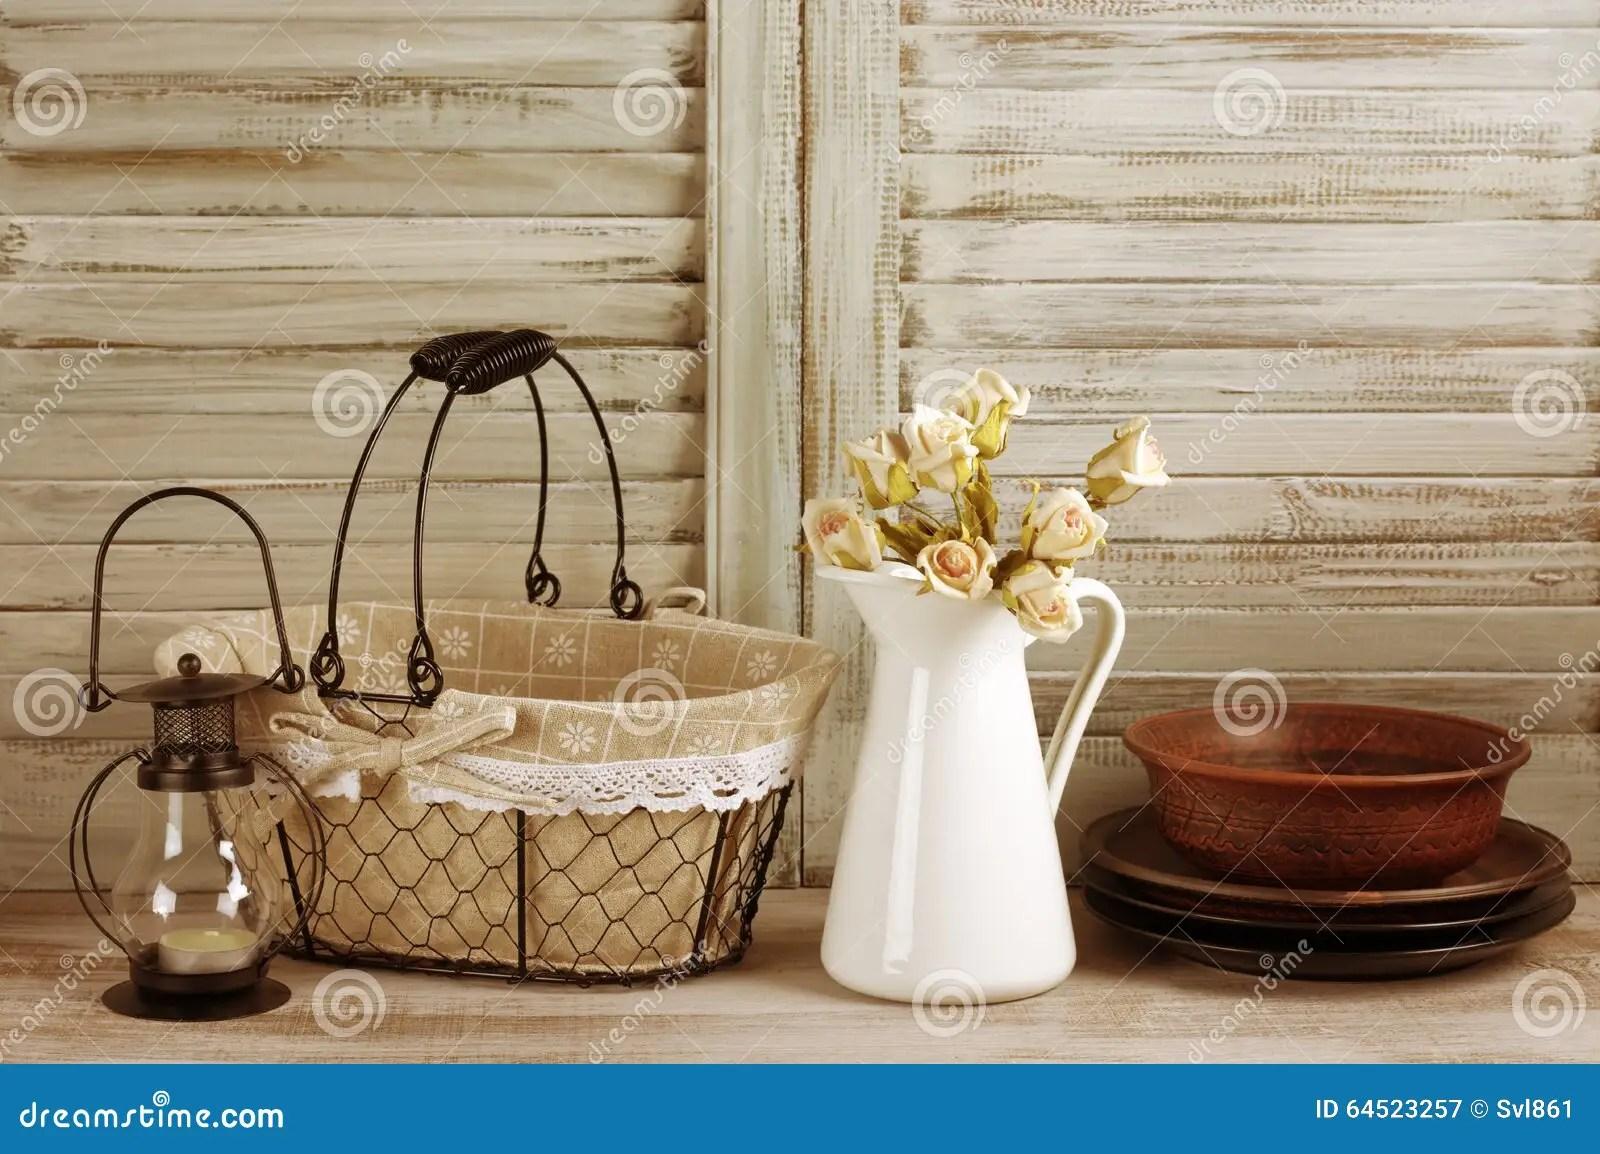 kitchen lanterns island lights 土气厨房静物画库存图片 图片包括有设计 灯笼 内部 国家 地区 土气厨房静物画 铁丝网筐 水罐有玫瑰束的 陶瓷餐具和灯笼反对葡萄酒木快门被过滤的被定调子的图象